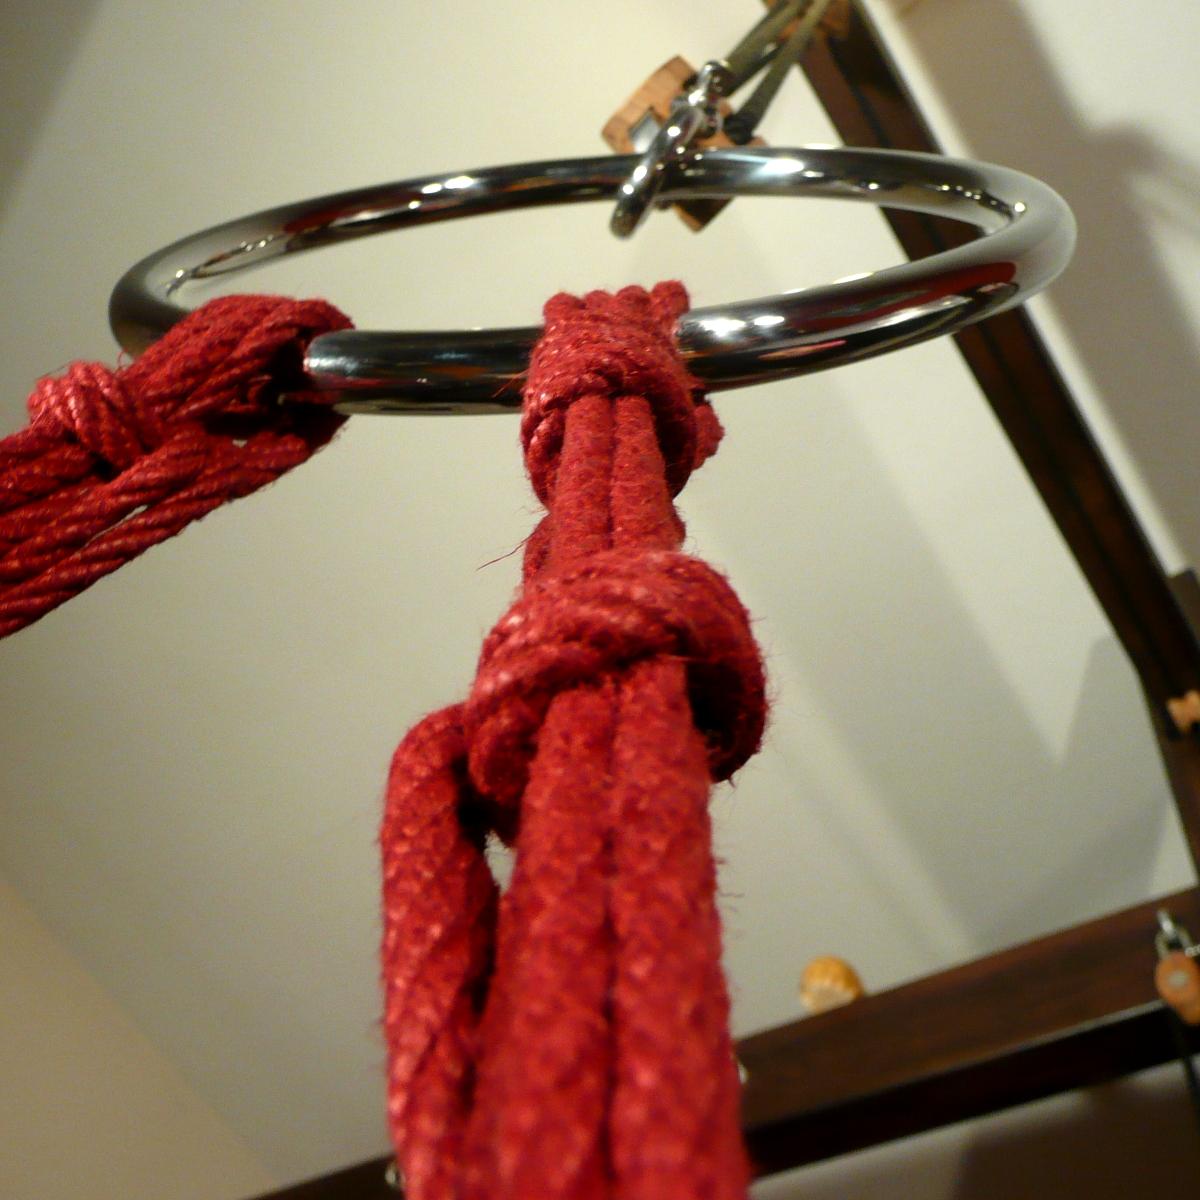 Rope bdsm video